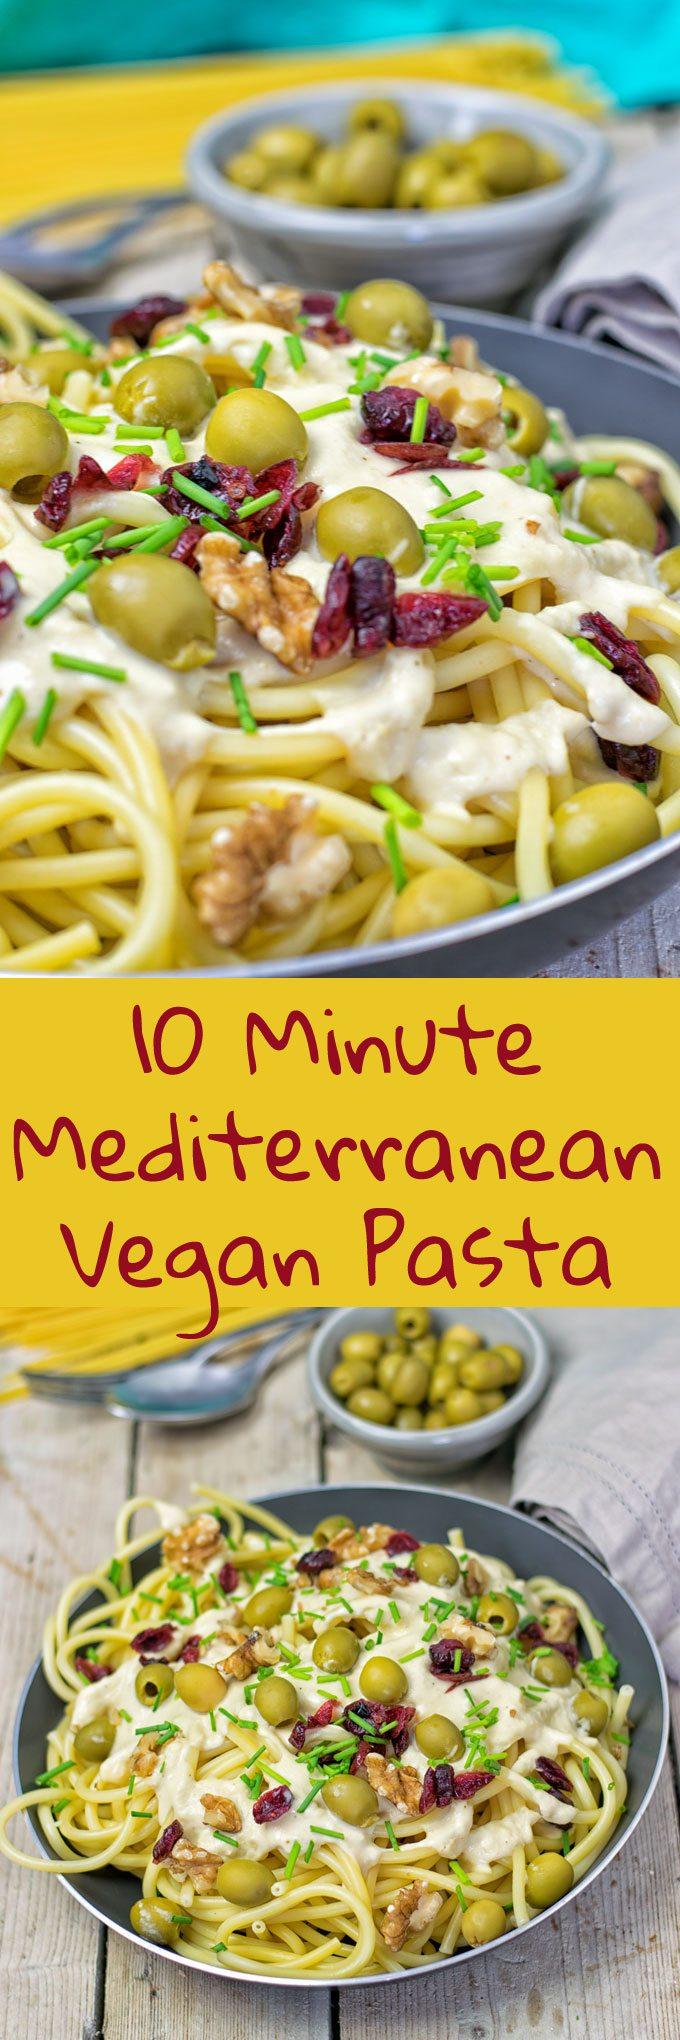 10 Minute Mediterranean Vegan Pasta | #vegan #glutenfree www.contentednesscooking.com